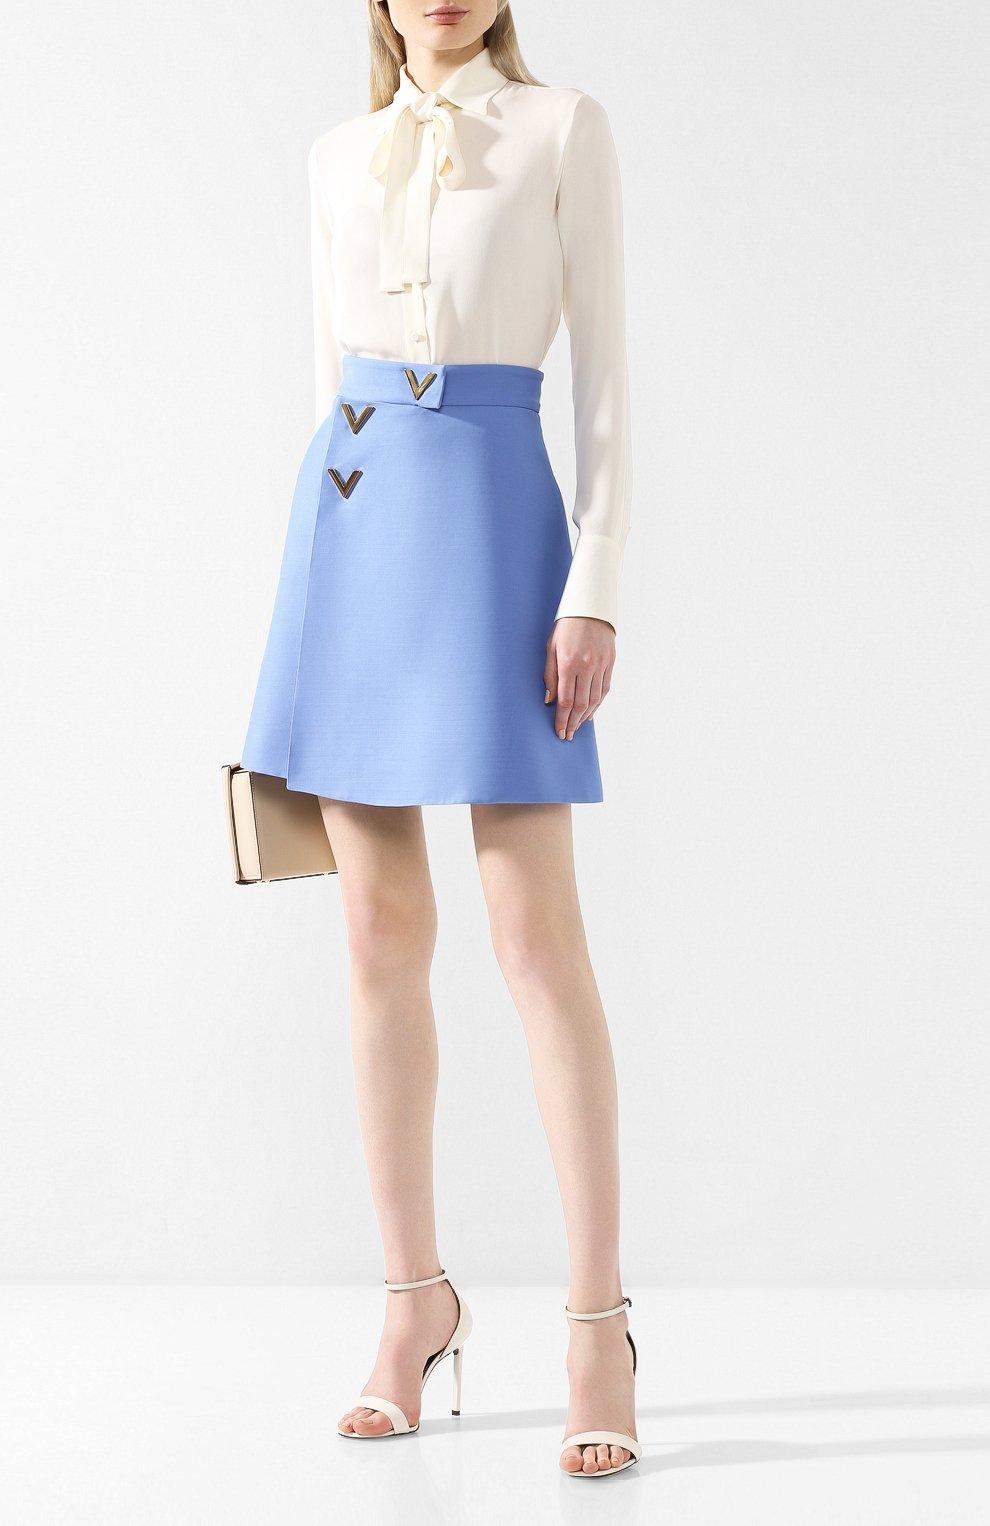 Юбка из смеси шерсти и шелка Valentino голубая | Фото №2